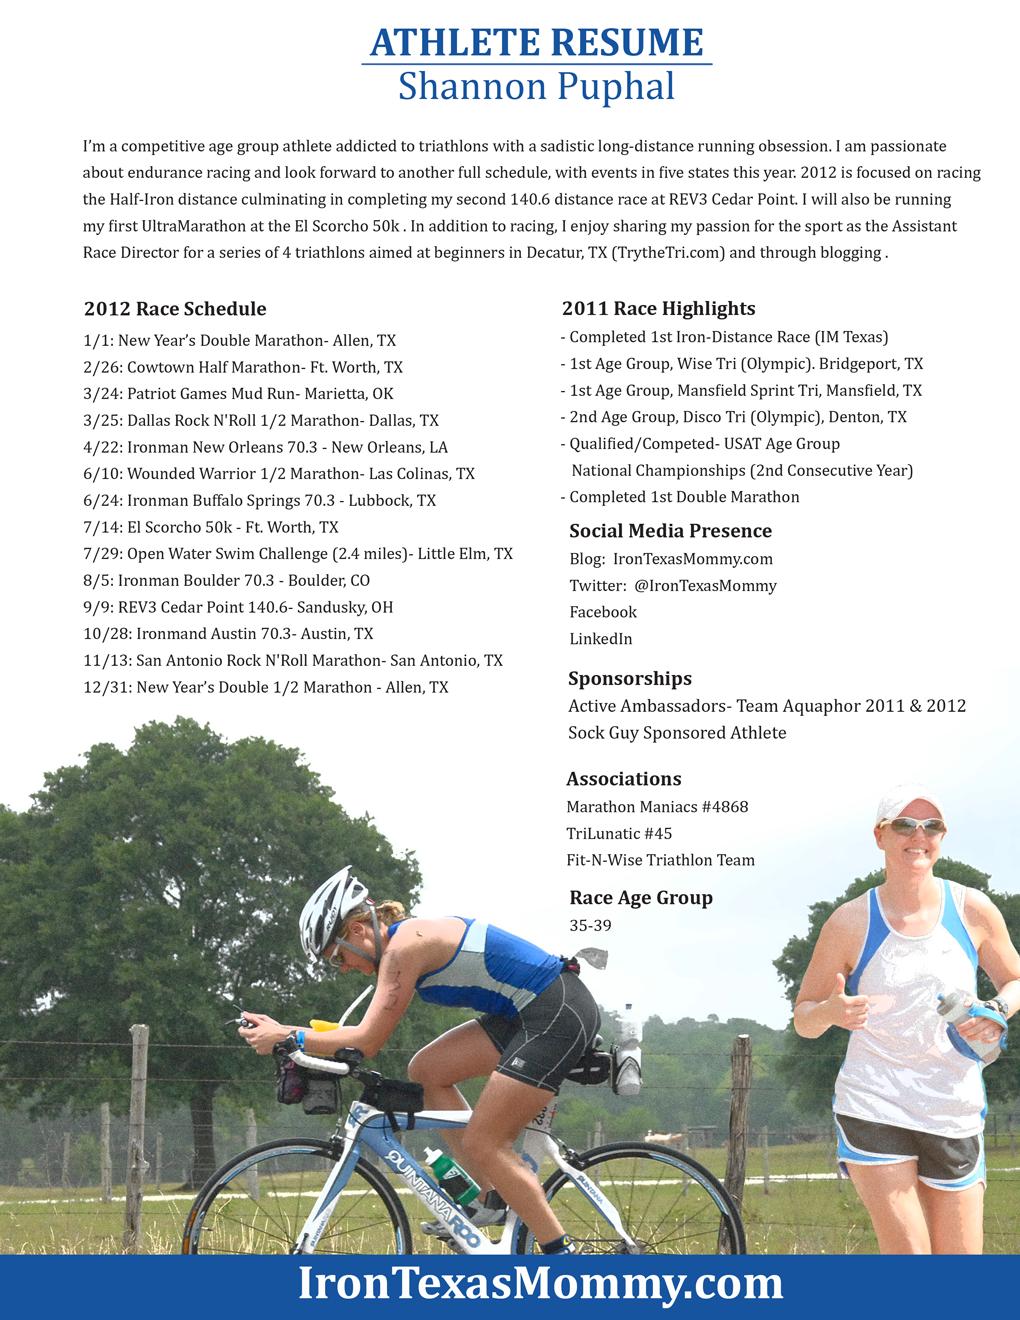 Athletic Resume athletic resume Professional Athlete Resumes